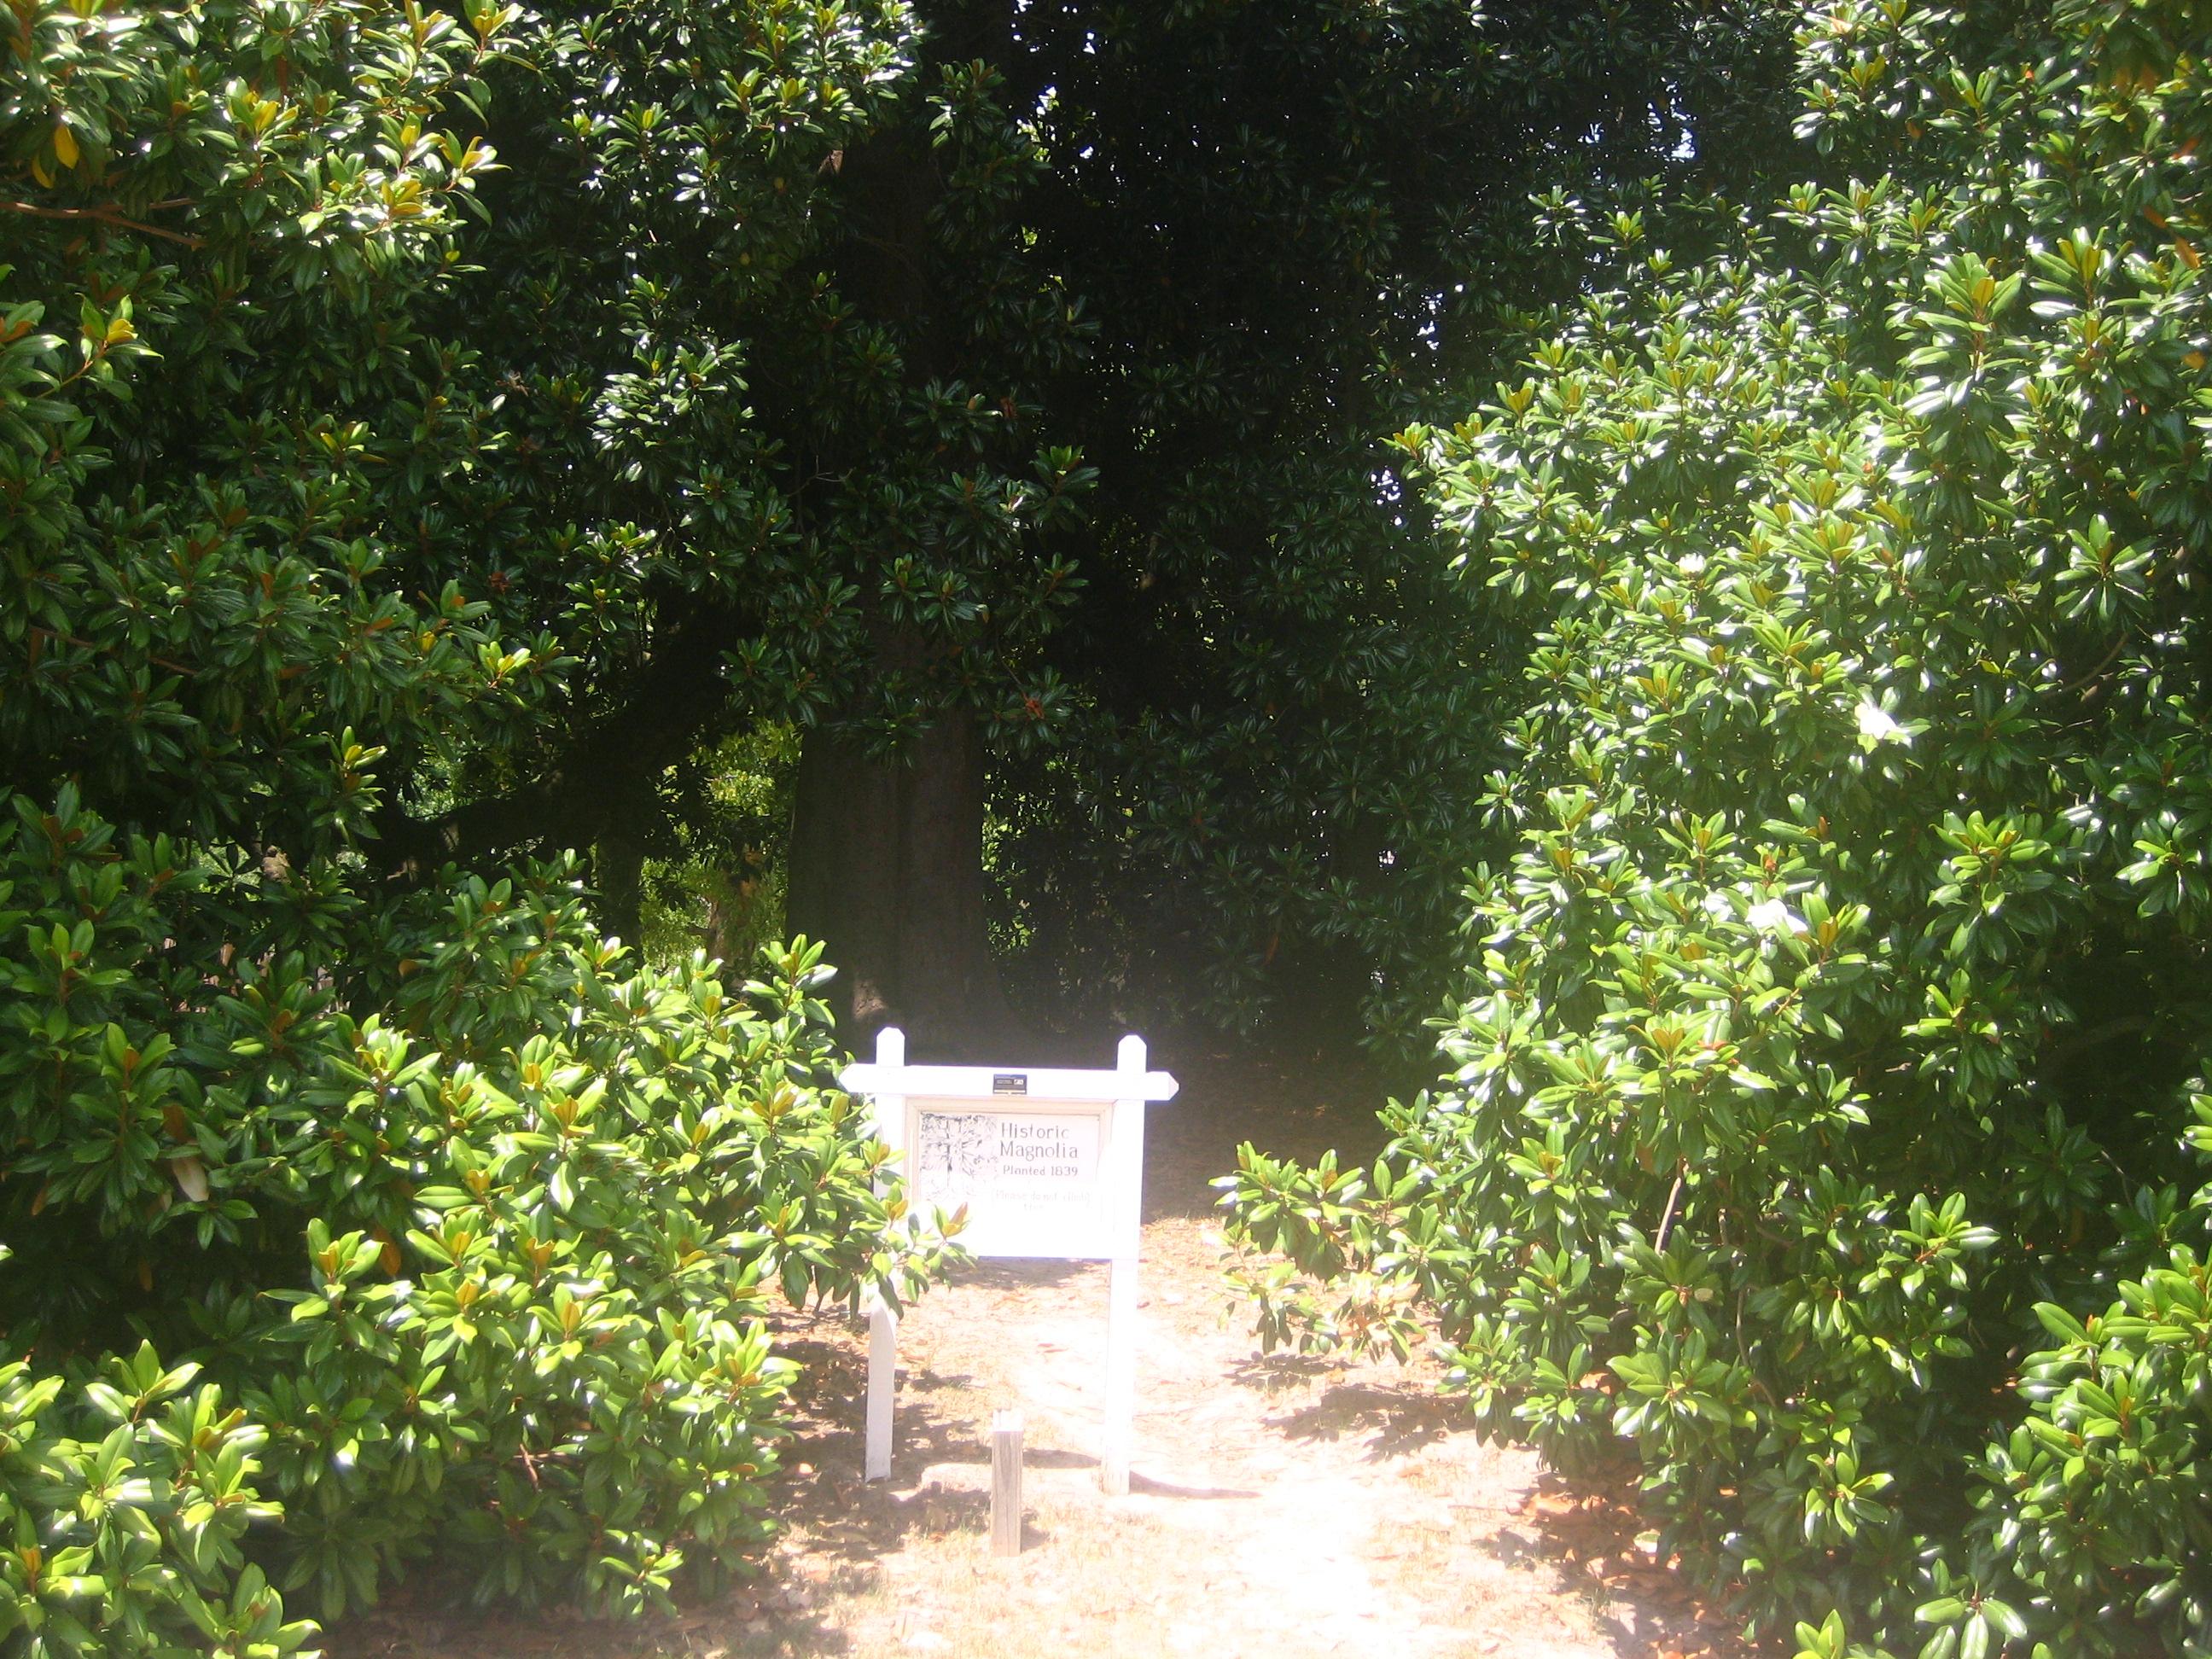 Filemagnolia Tree At Historic Washington State Park Img 1484jpg